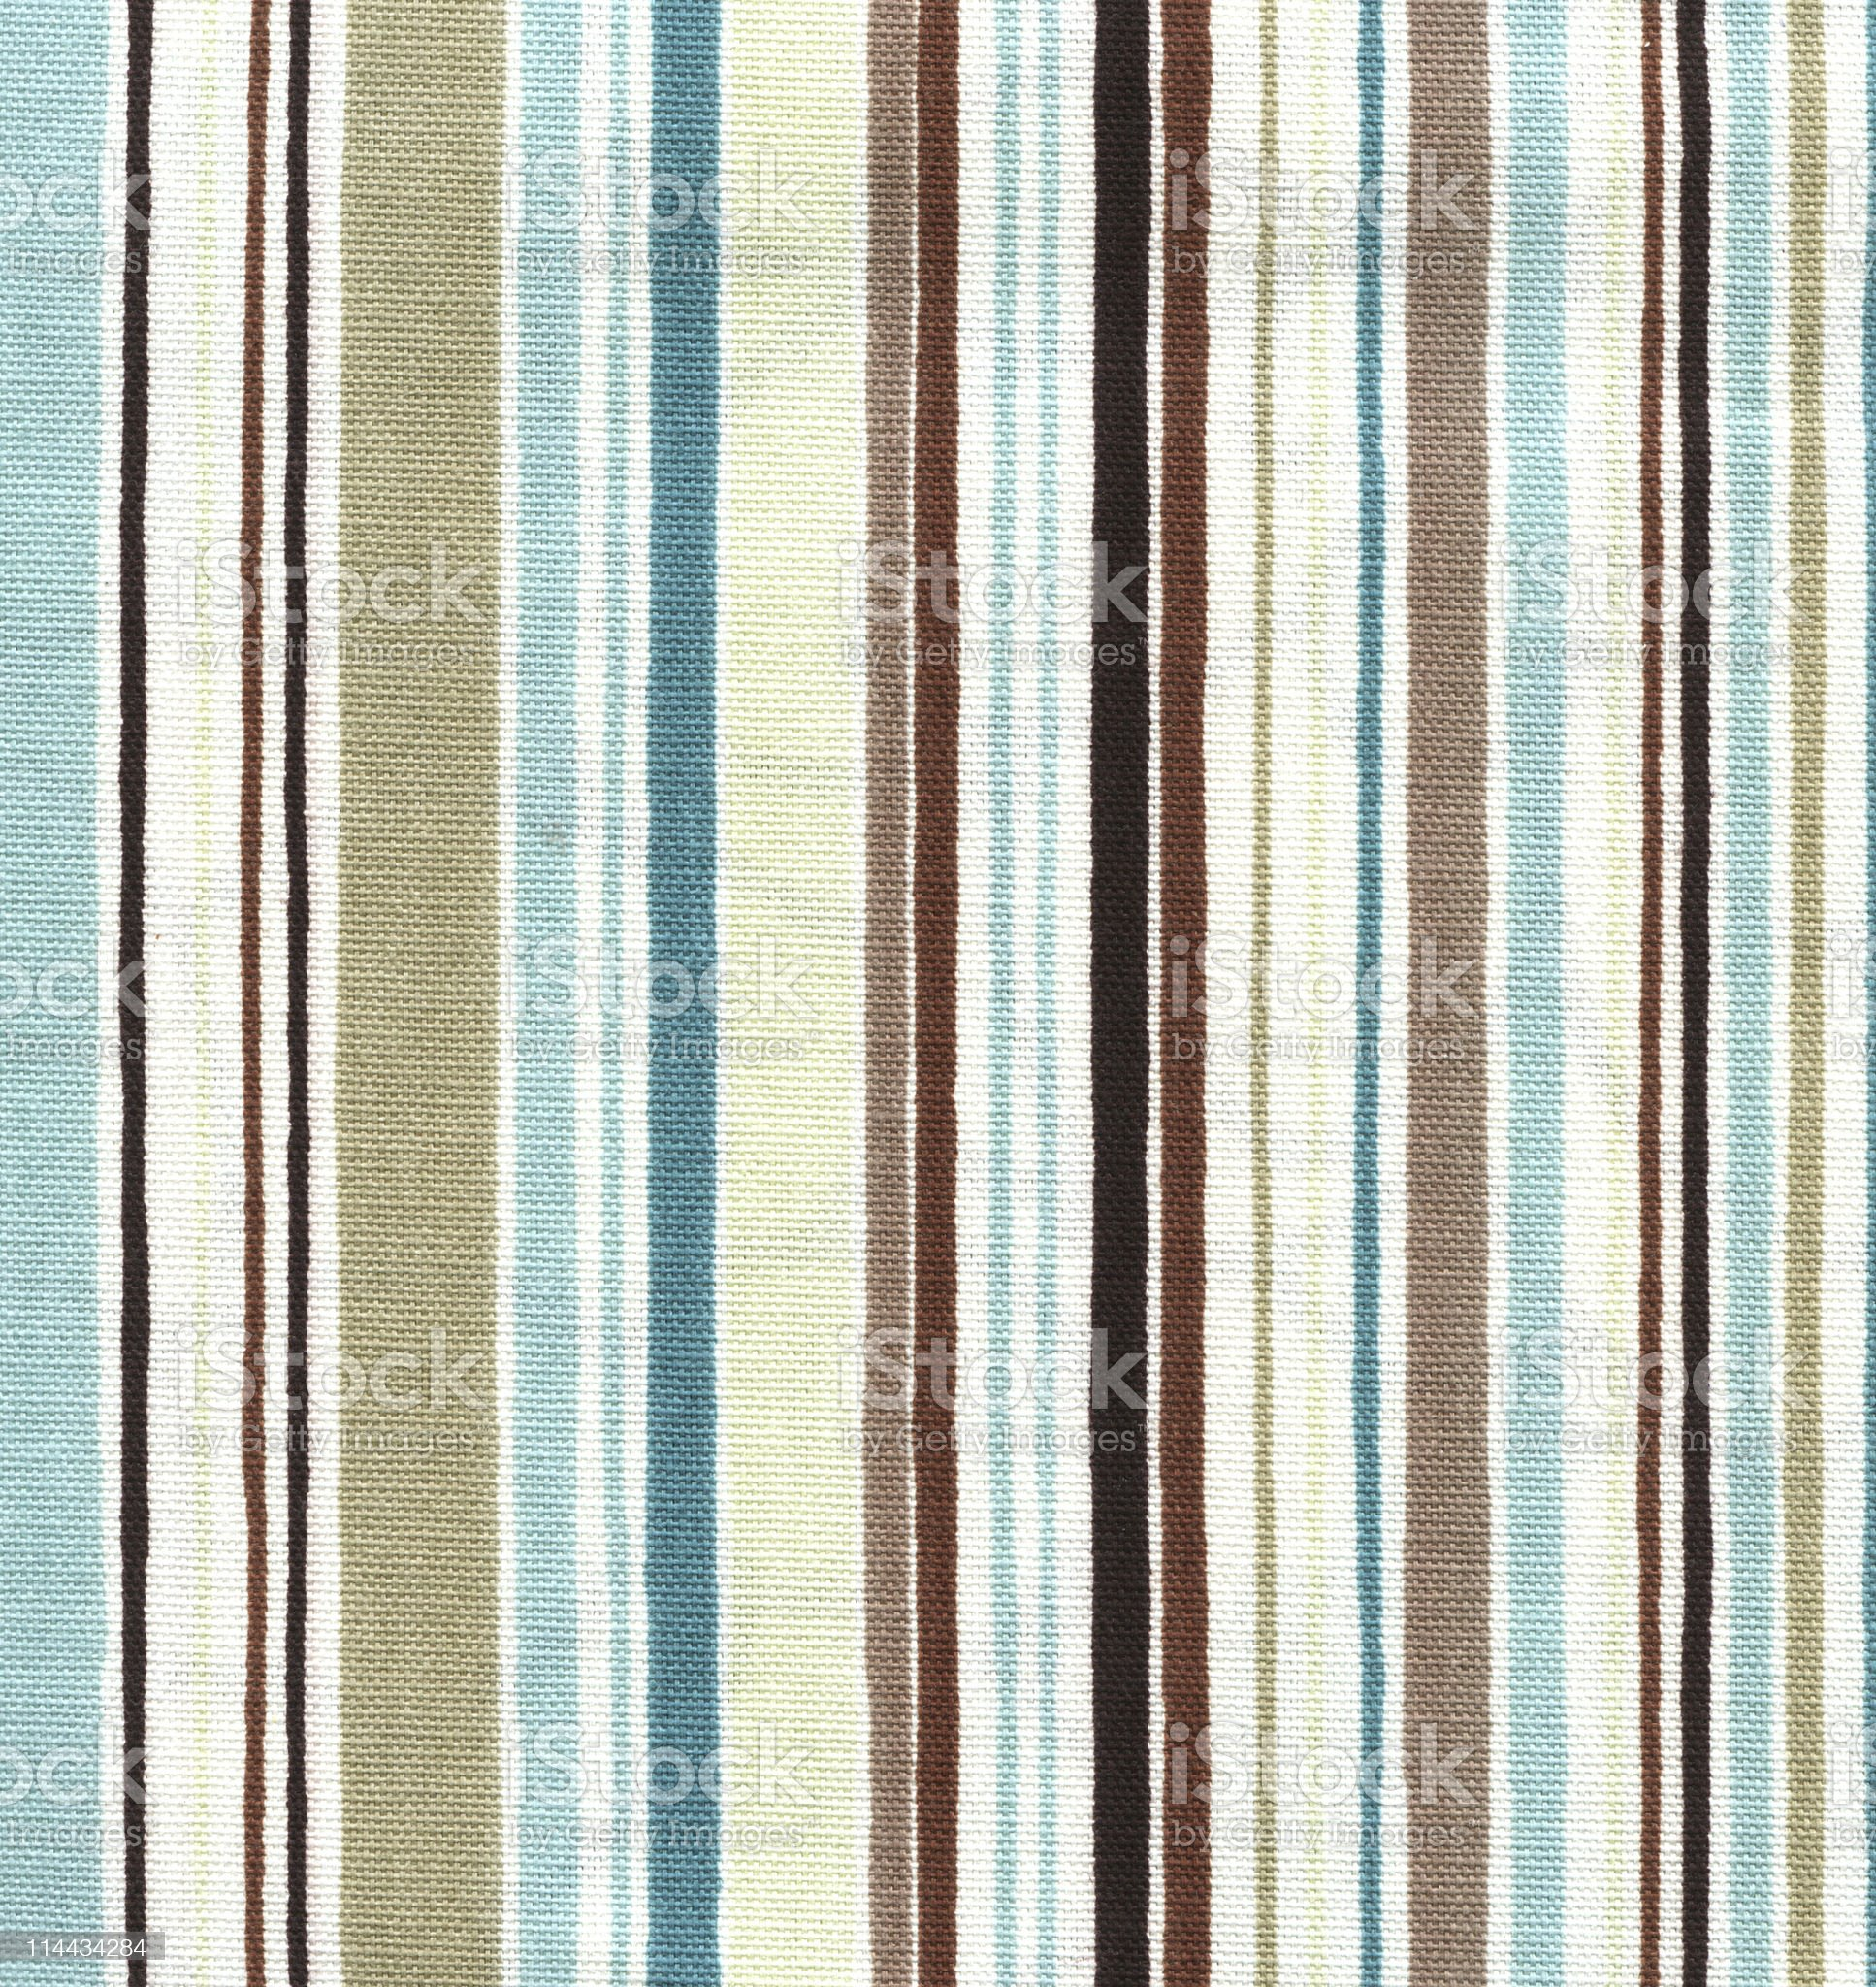 cotton fabric royalty-free stock photo